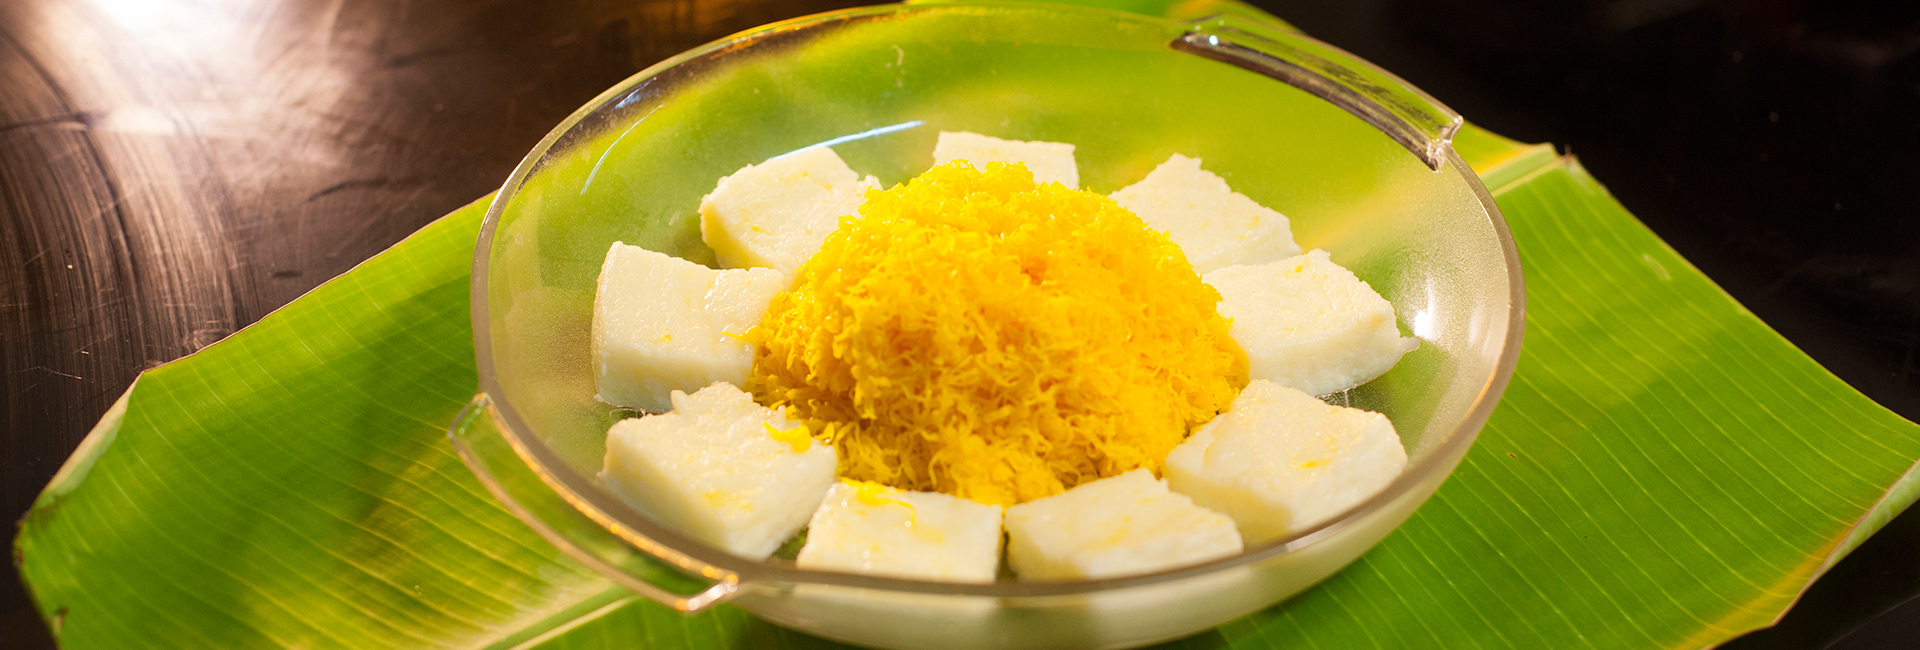 Kerala Cuisine Contest 2020-21